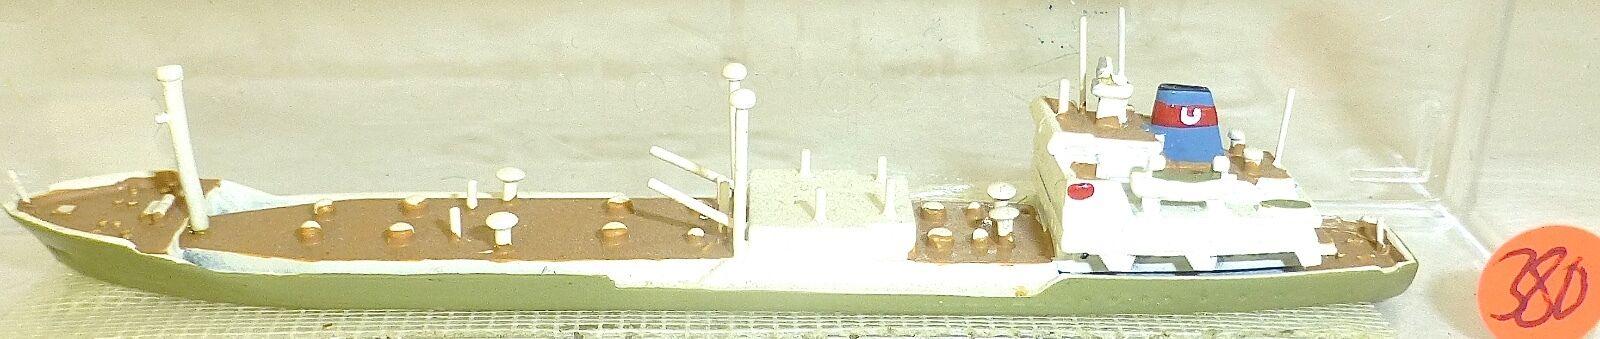 Gastanker Gammagas Hansa S301 Modèle de Bateau 1 1250 SHP380 Å